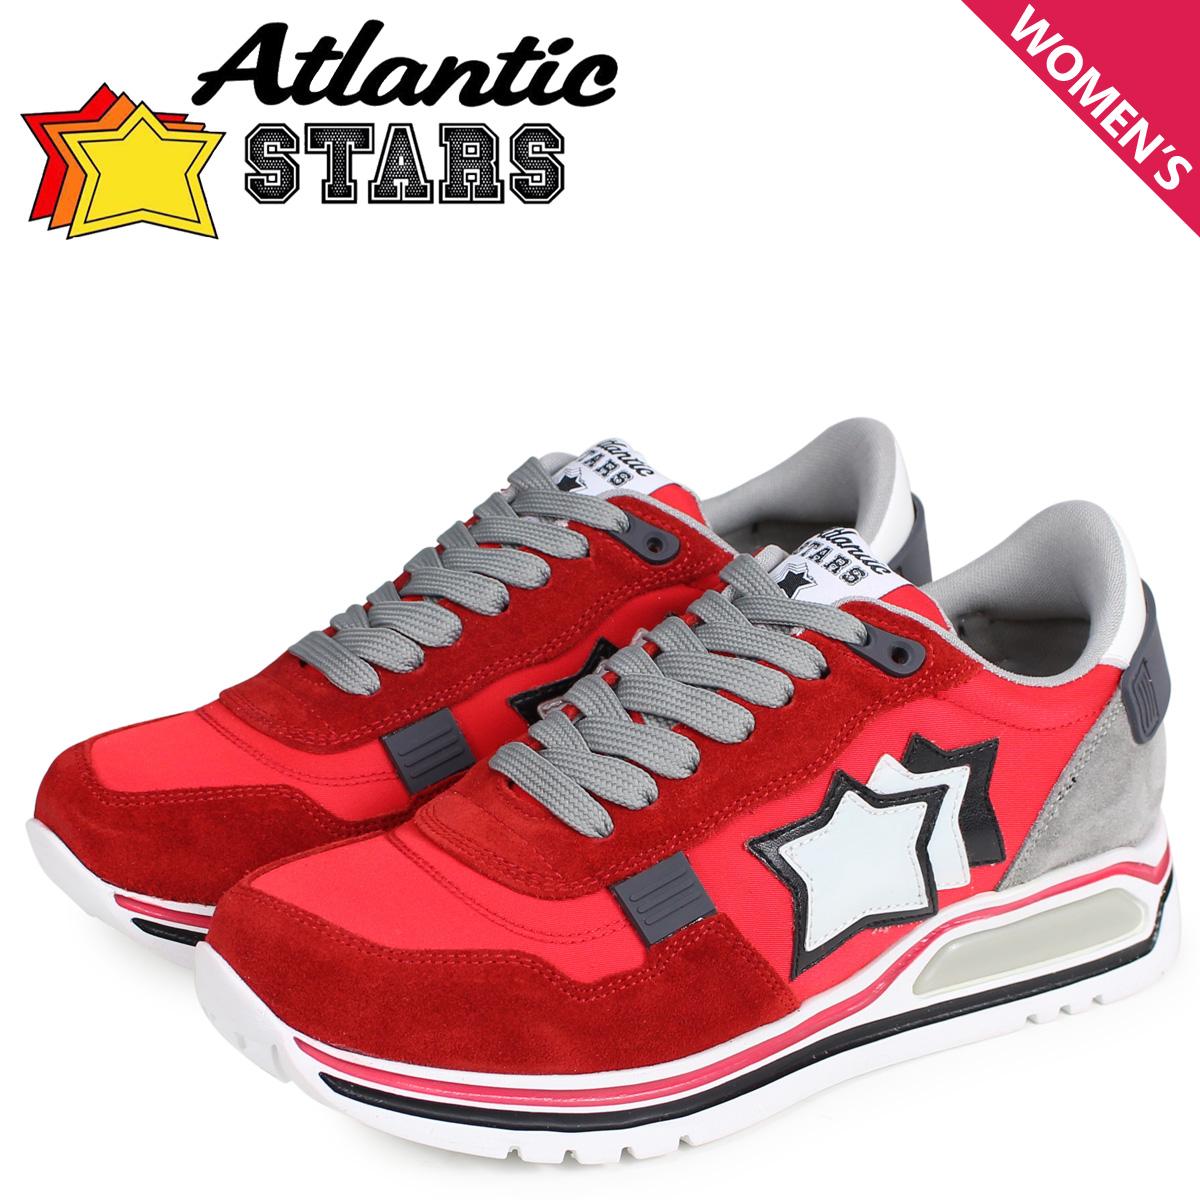 Atlantic STARS アトランティックスターズ スニーカー レディース シャカ SHAKA レッド CF-J04 [4/3 新入荷]